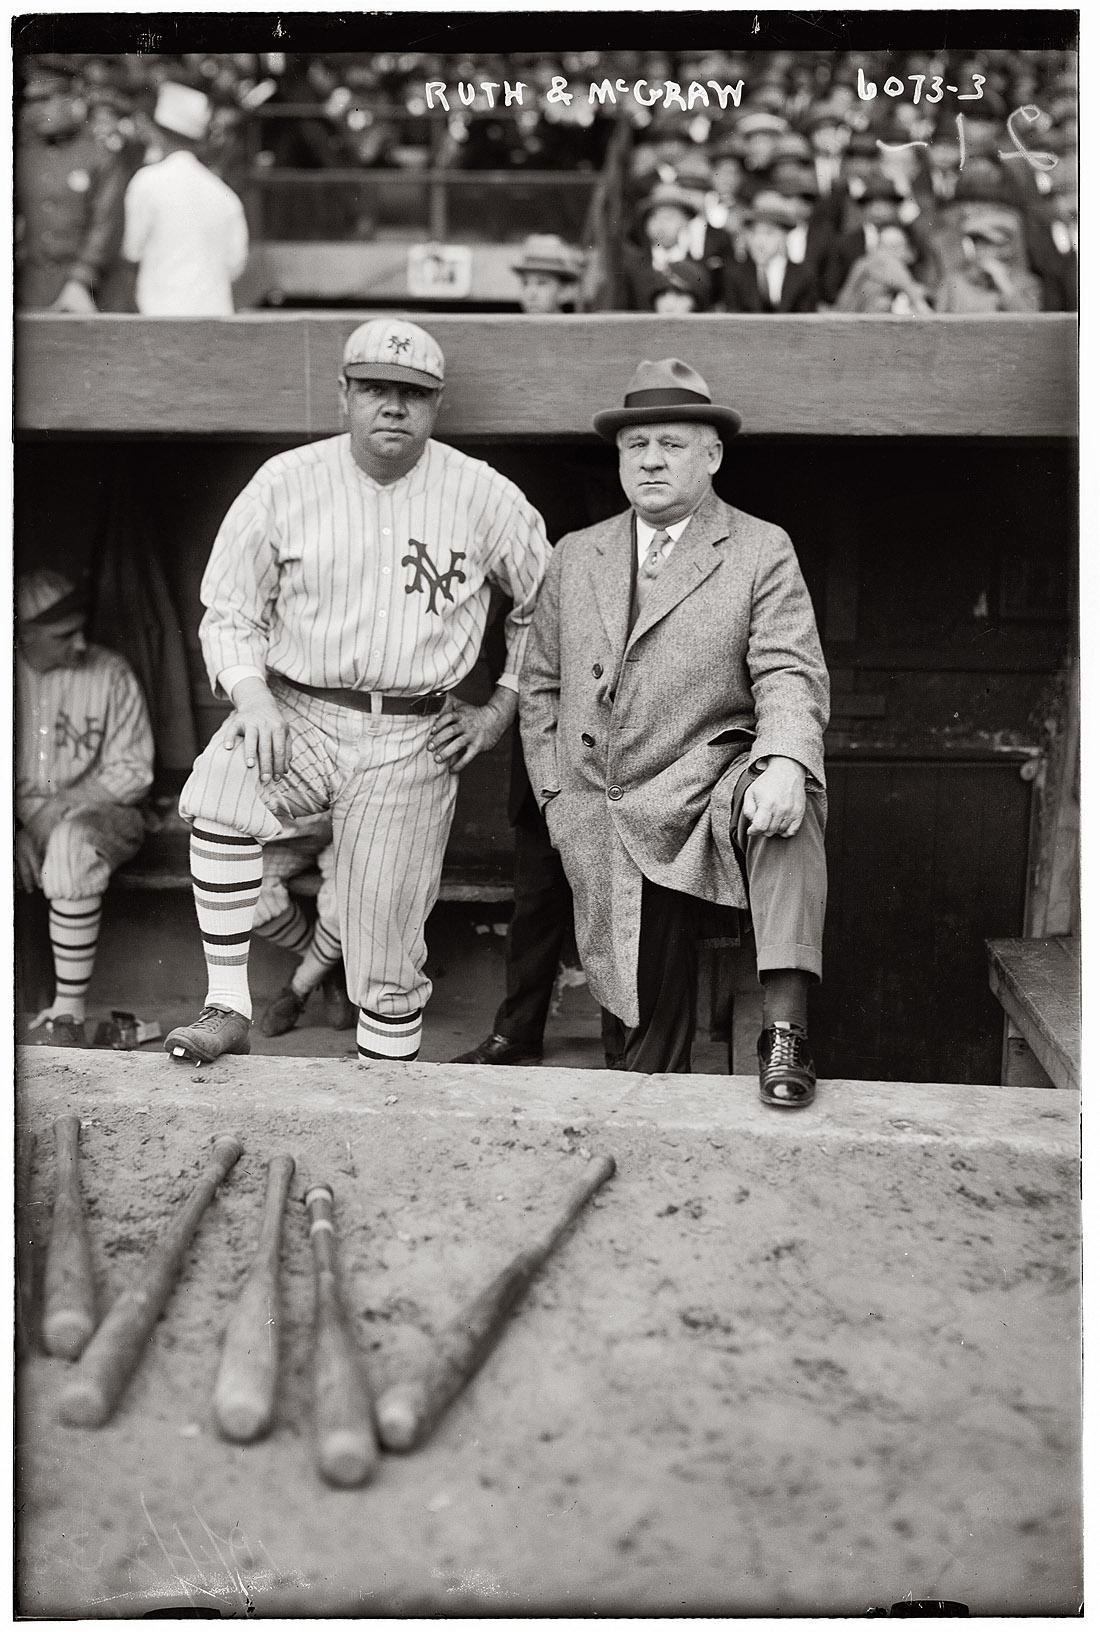 d95bbf619 Get free high quality HD wallpapers new york giants baseball uniform history